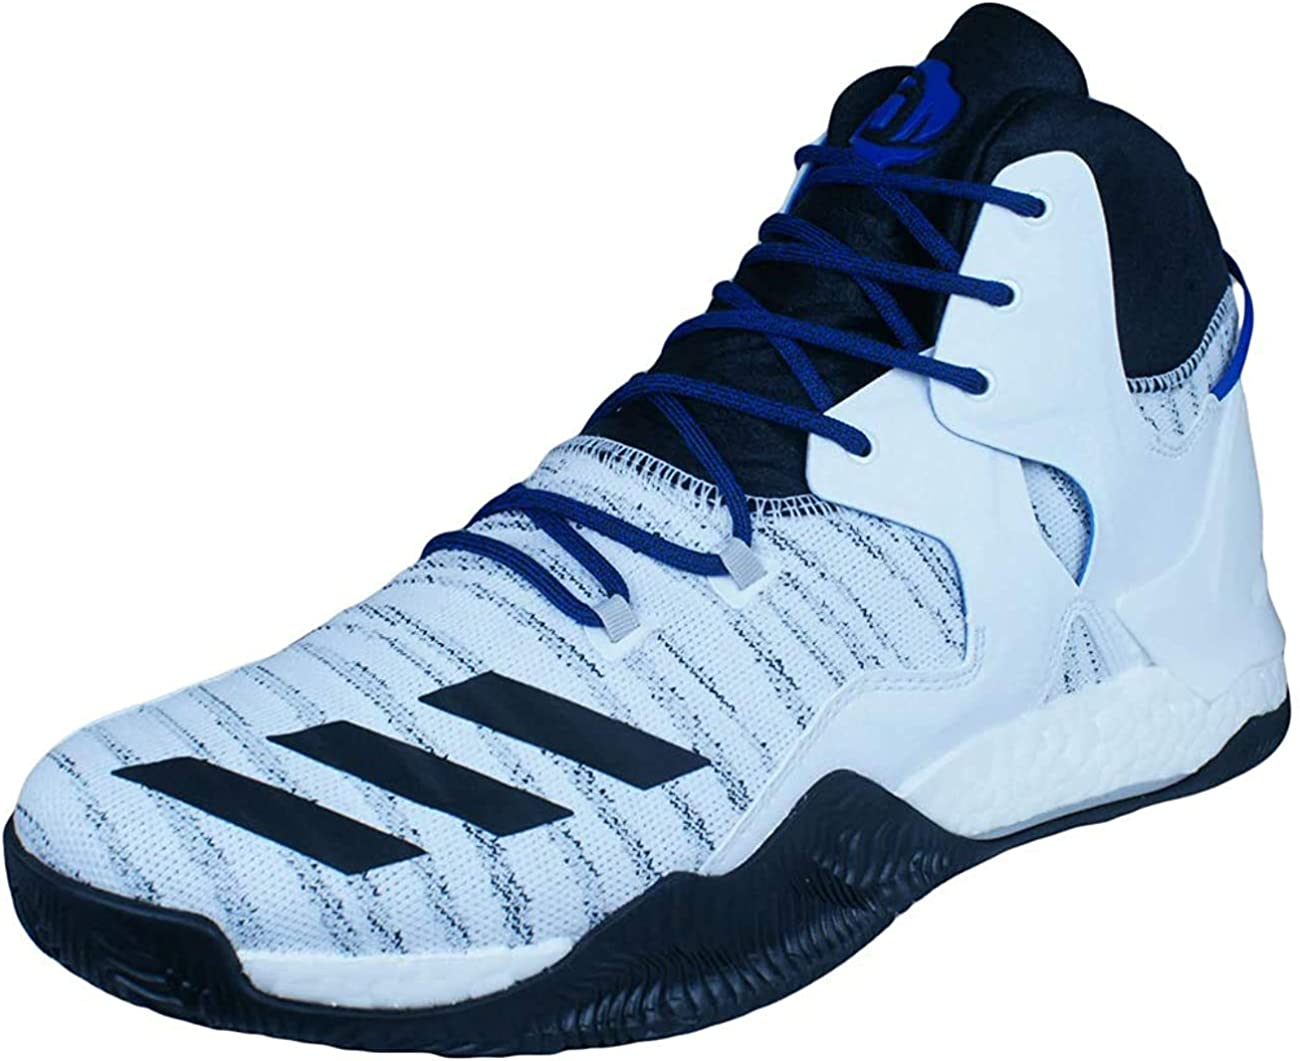 Adidas Performance D Rose 7 Primeknit, Chaussures de